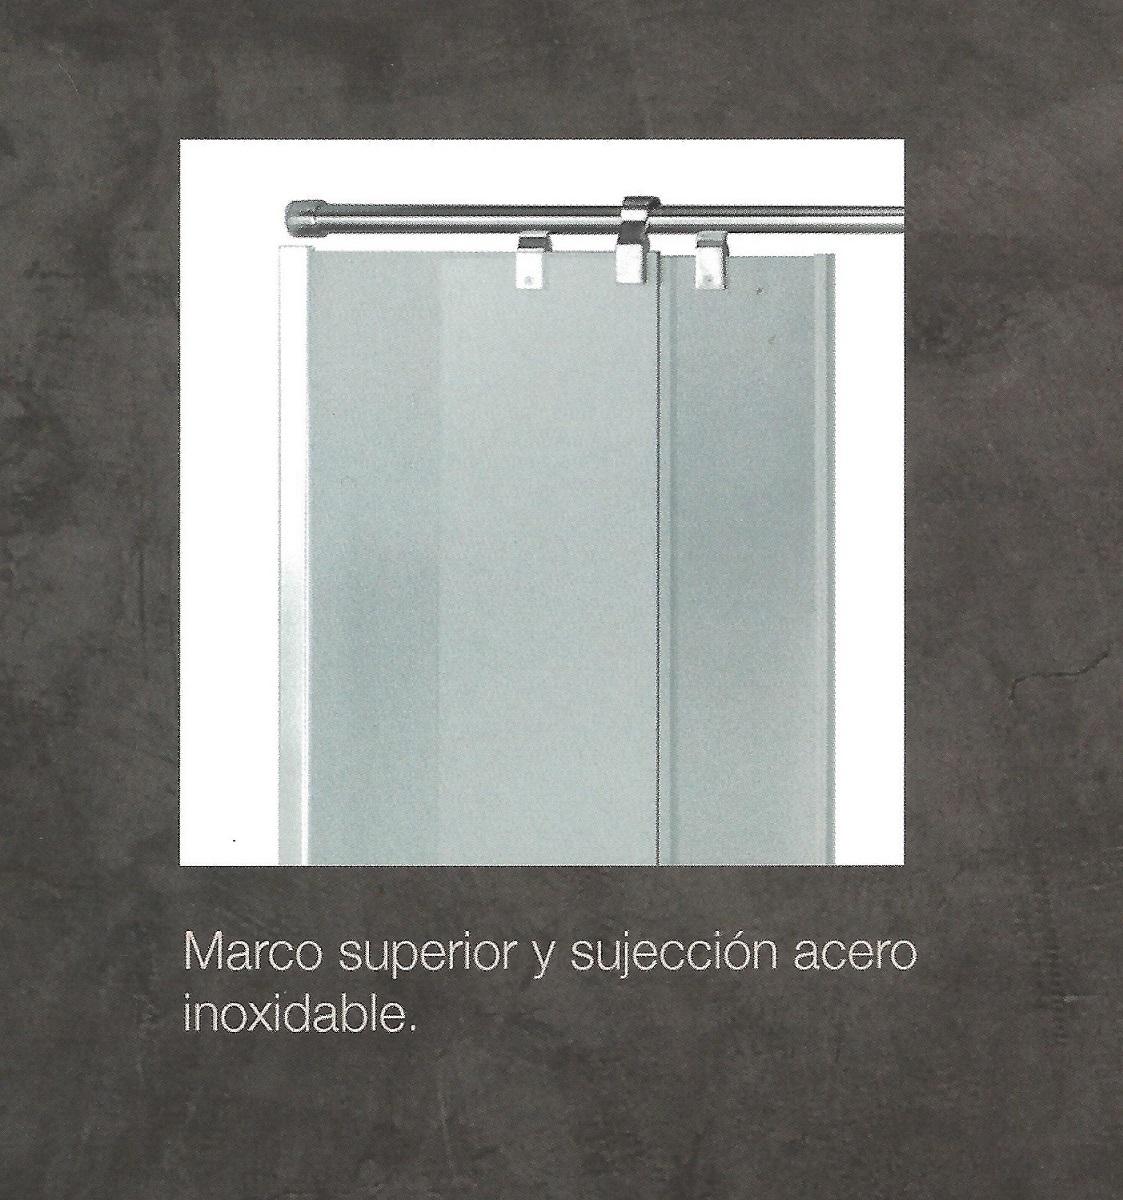 Mampara angular ducha mod sensacion 4 hojas inoxidable - Mampara vidrio templado ...